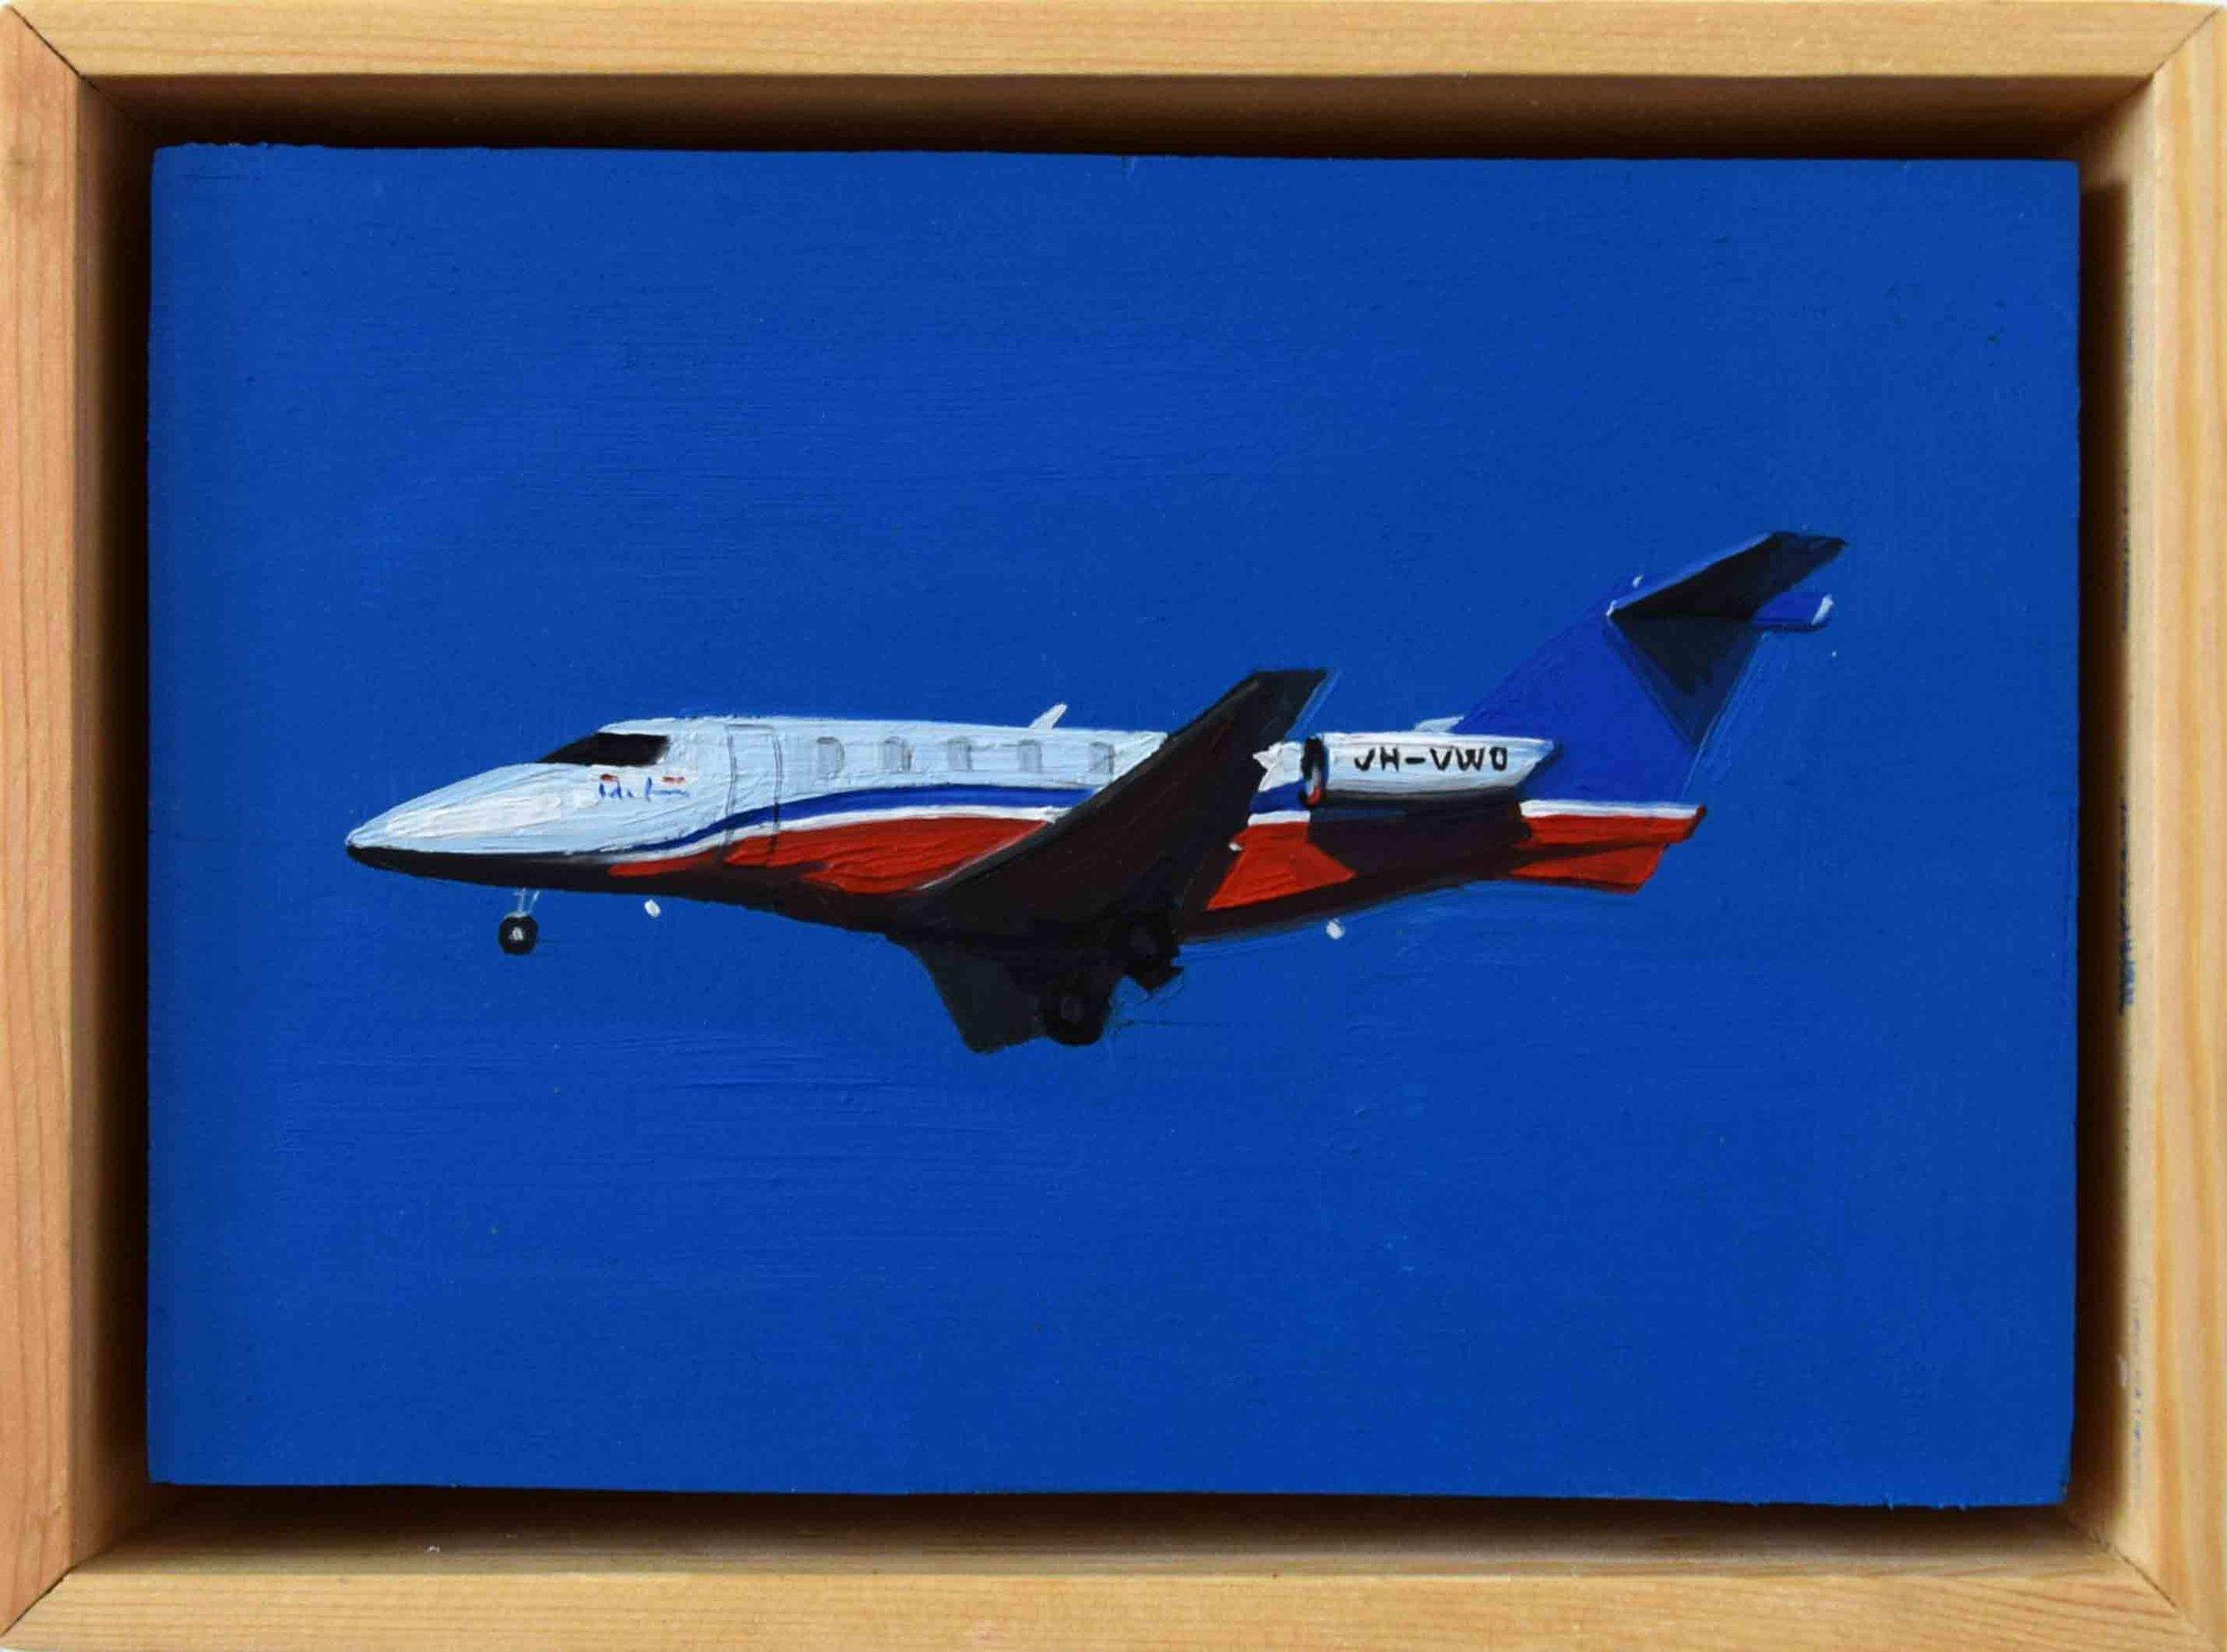 6. Ellen Norrish,  @feilencolin Royal Flying Doctor enroute to Perth International airport,  2019, oil on board, 13 x 17 cm